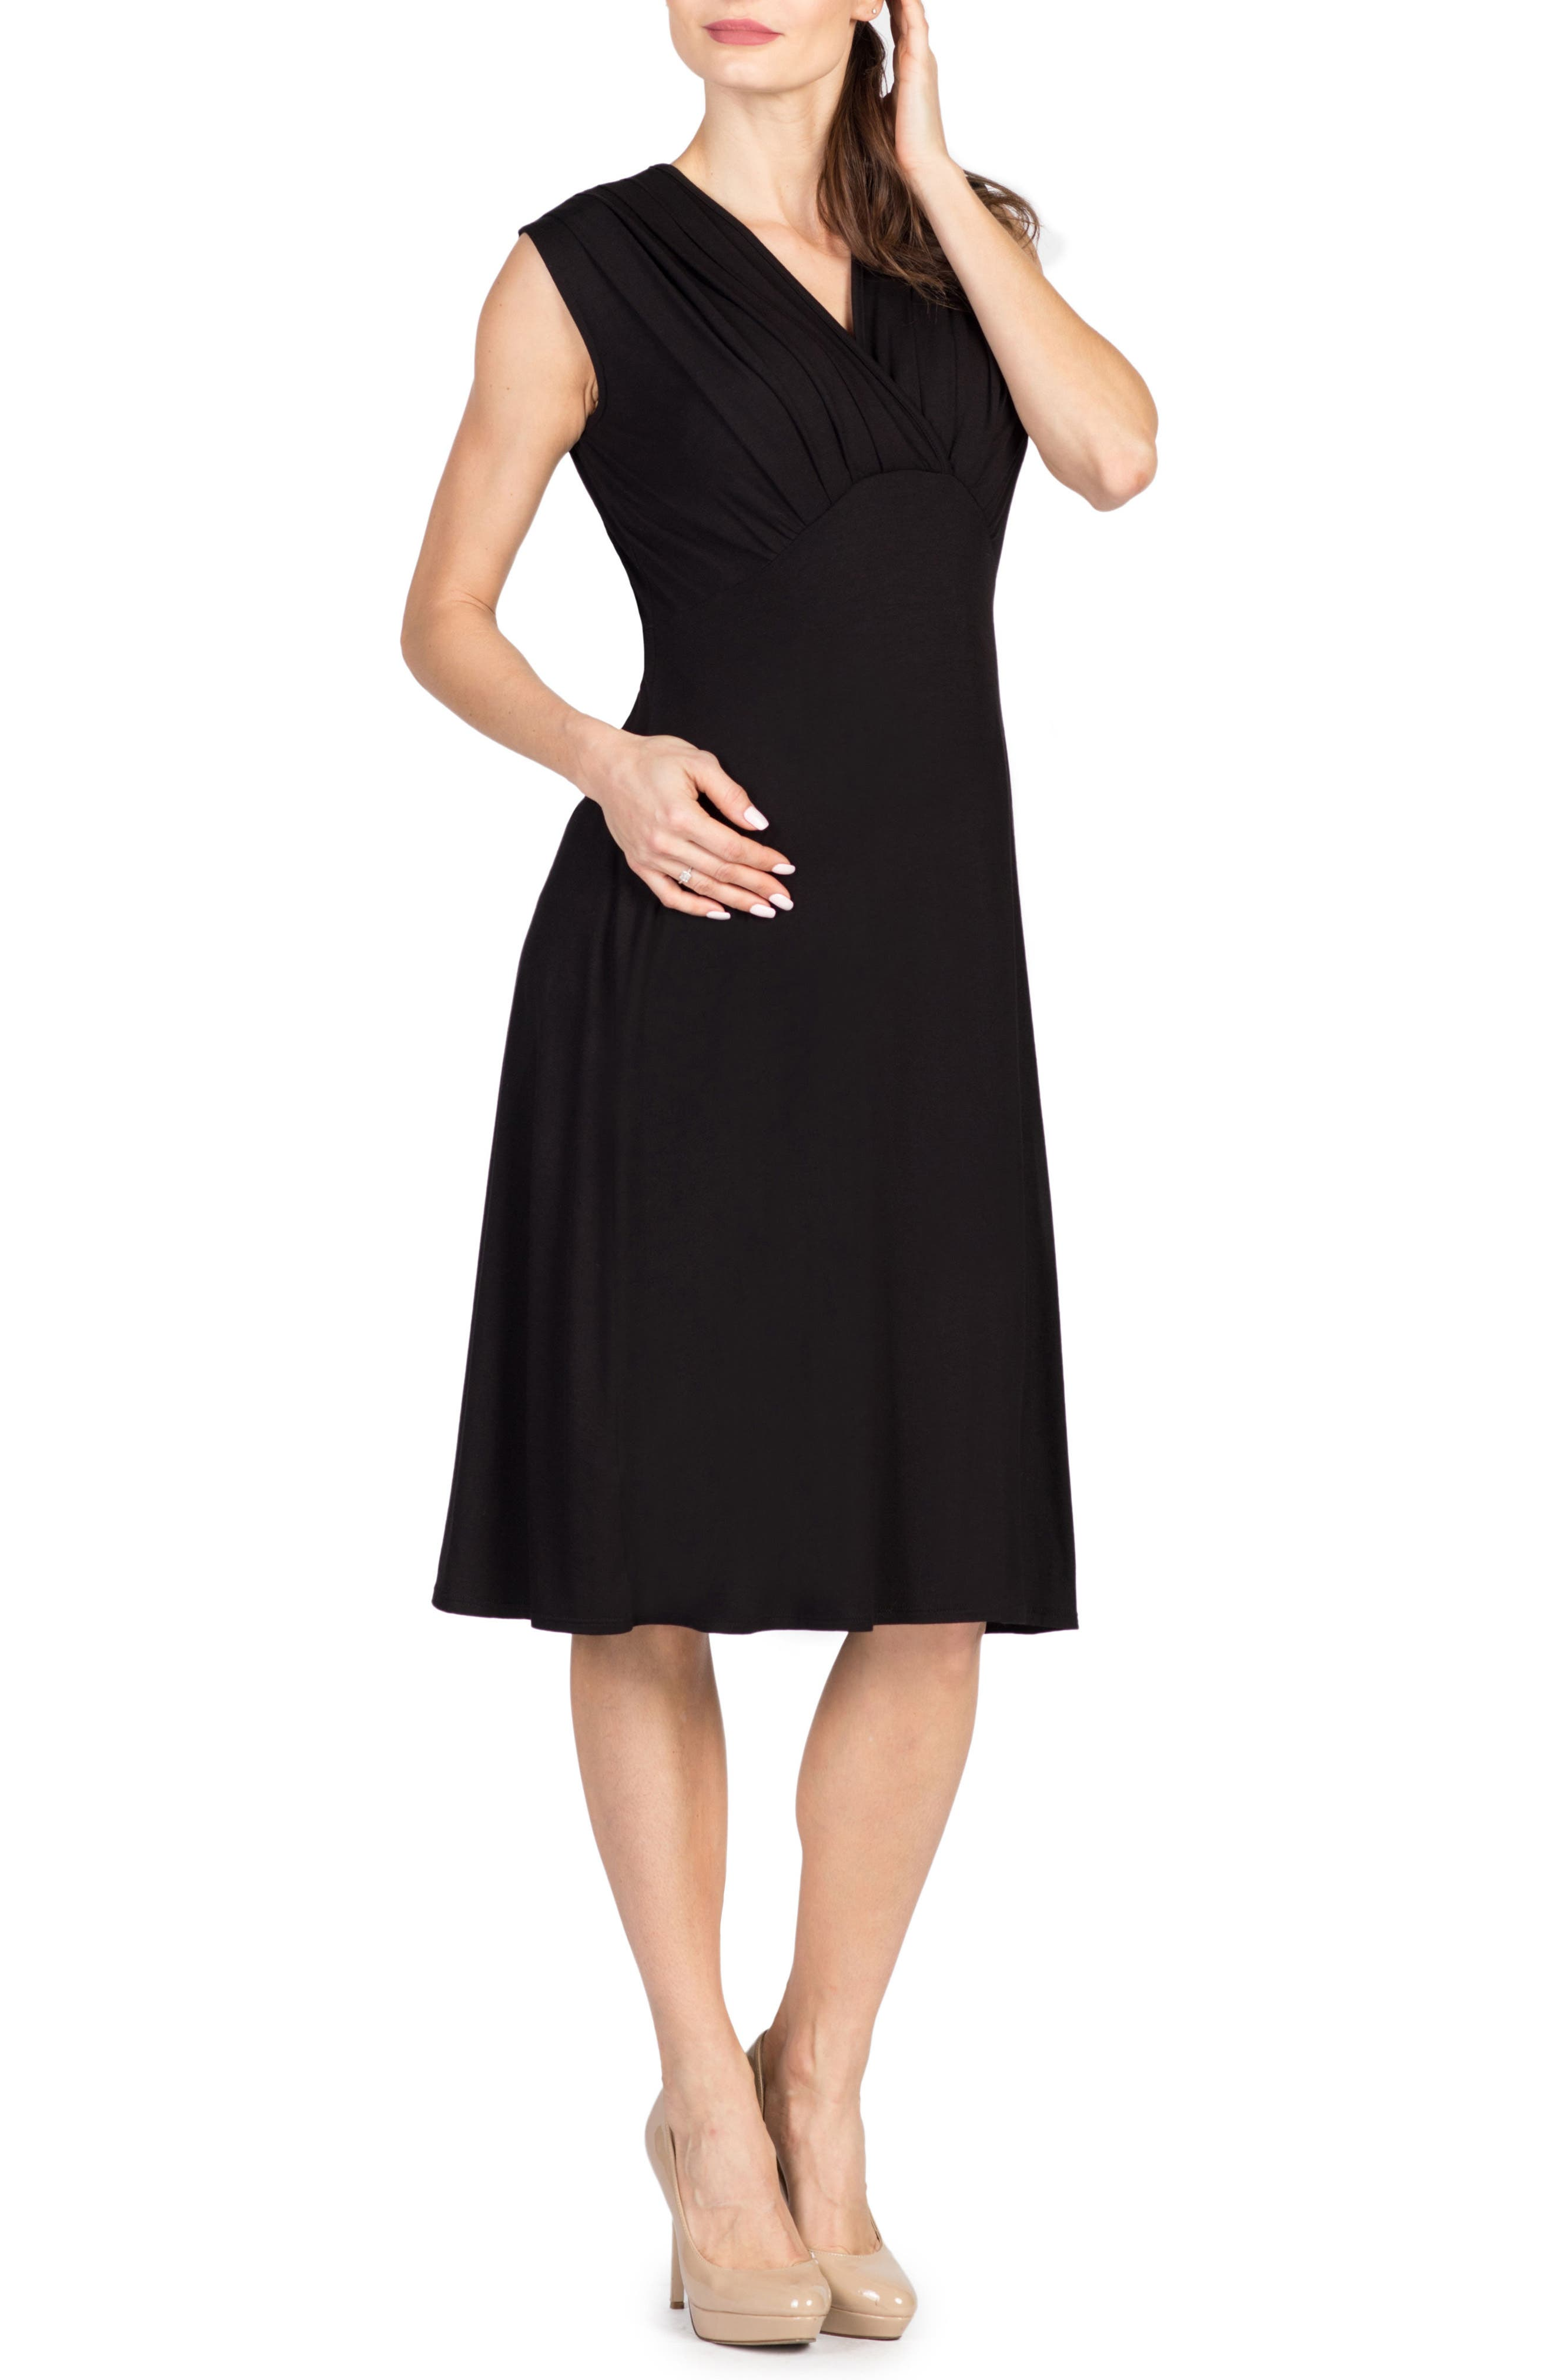 Savi Mom Valencia Maternity/nursing Dress, Black